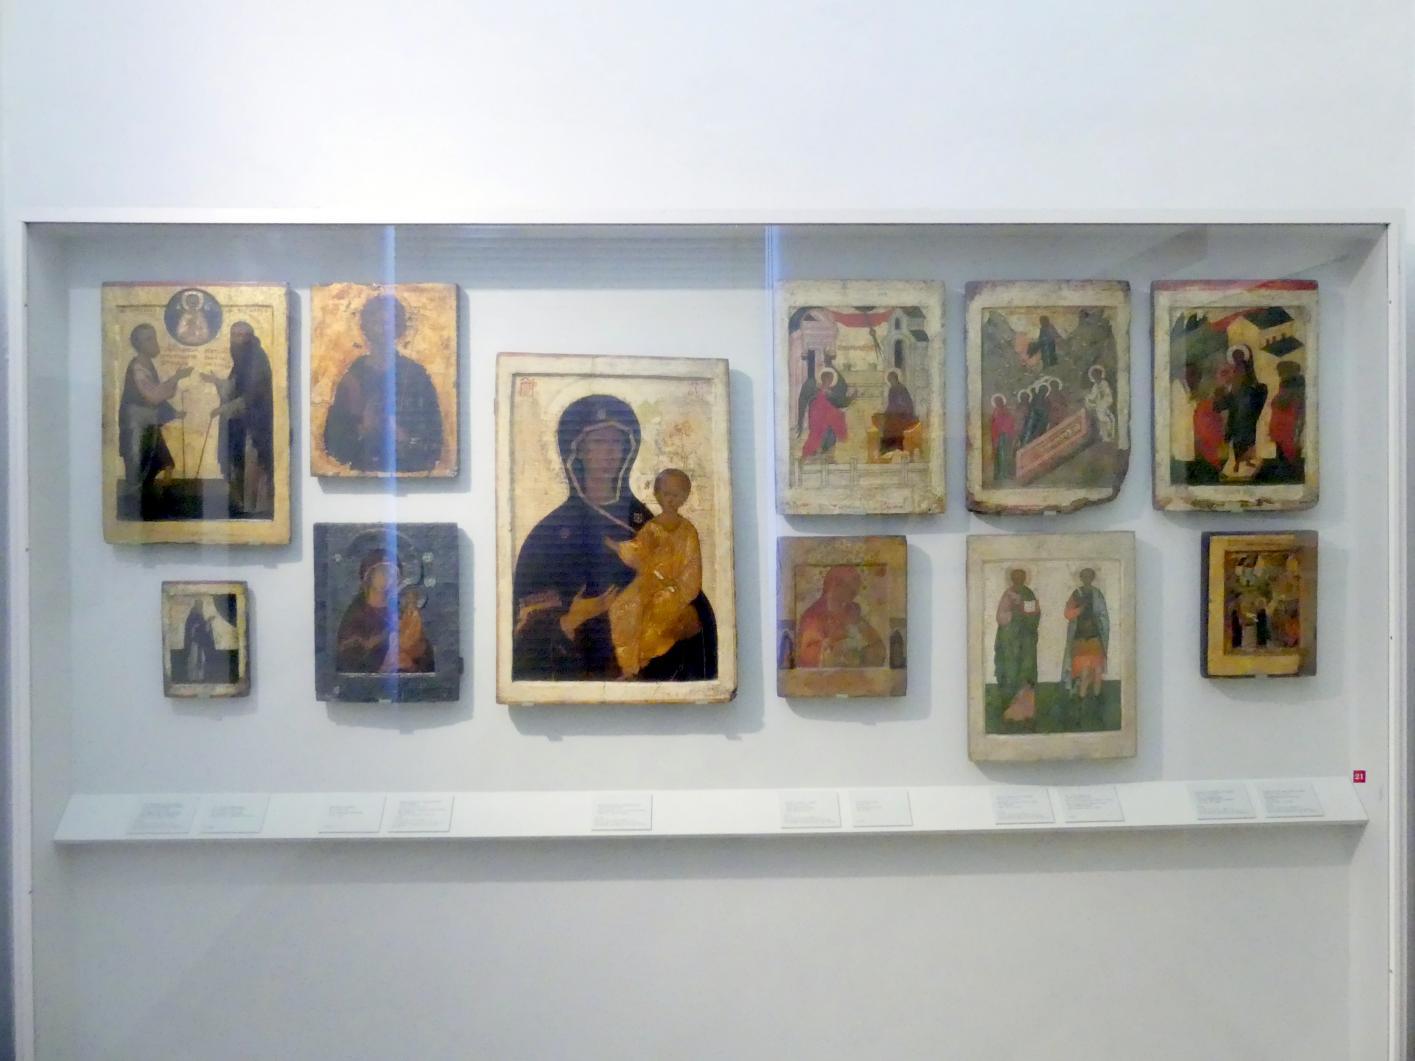 Prag, Nationalgalerie im Palais Sternberg, 1. Obergeschoss, Saal 6